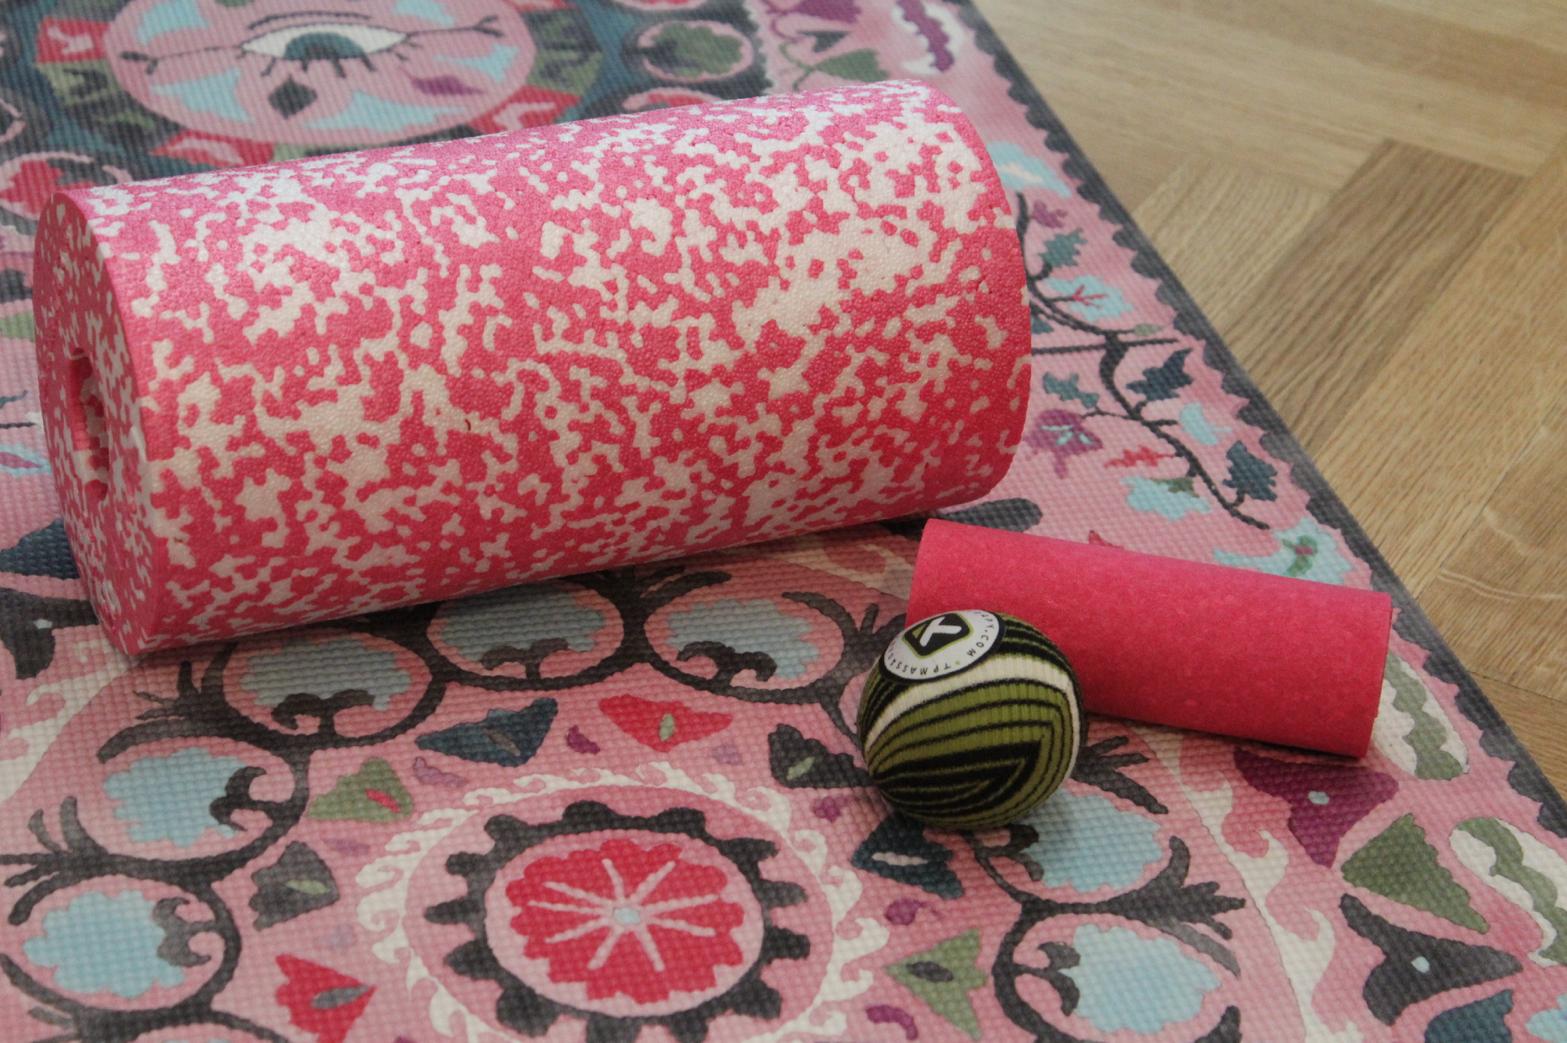 17 Blackroll Trigger Point Ball Yogamatte Magic Yoga Carpets Suzani Blush